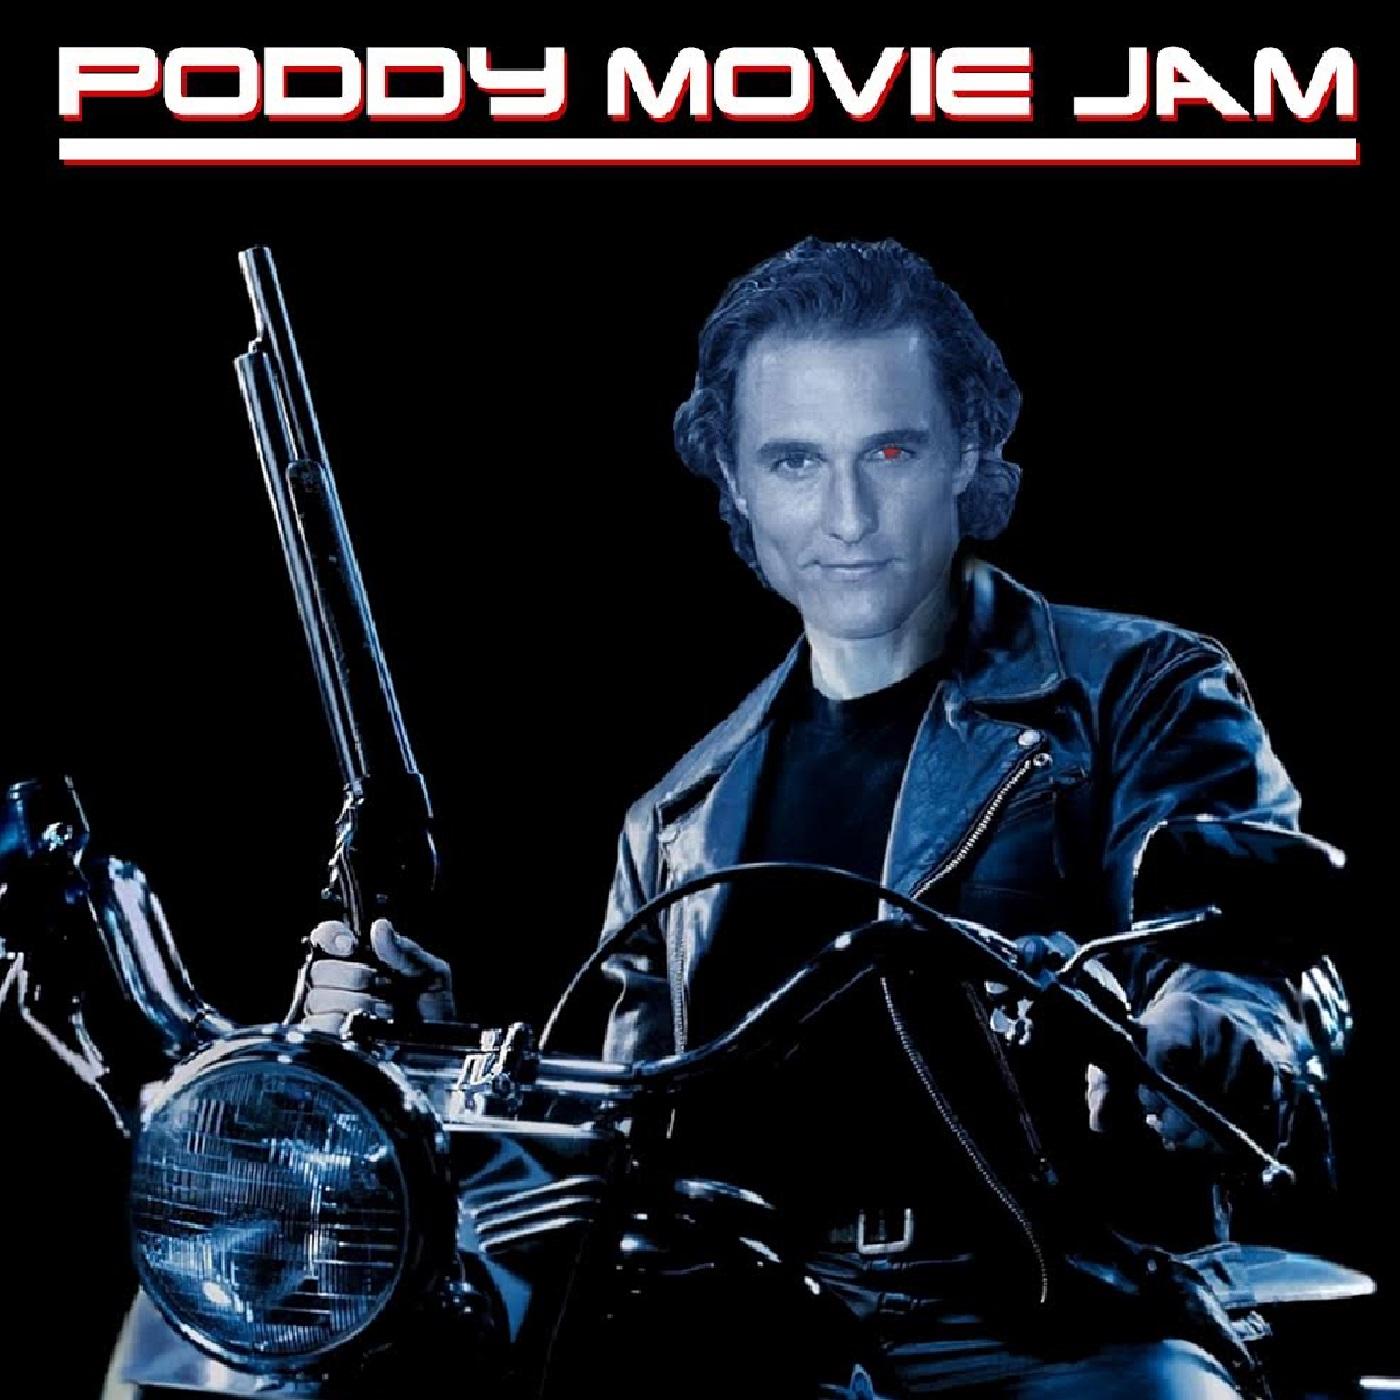 Poddy Movie Jam